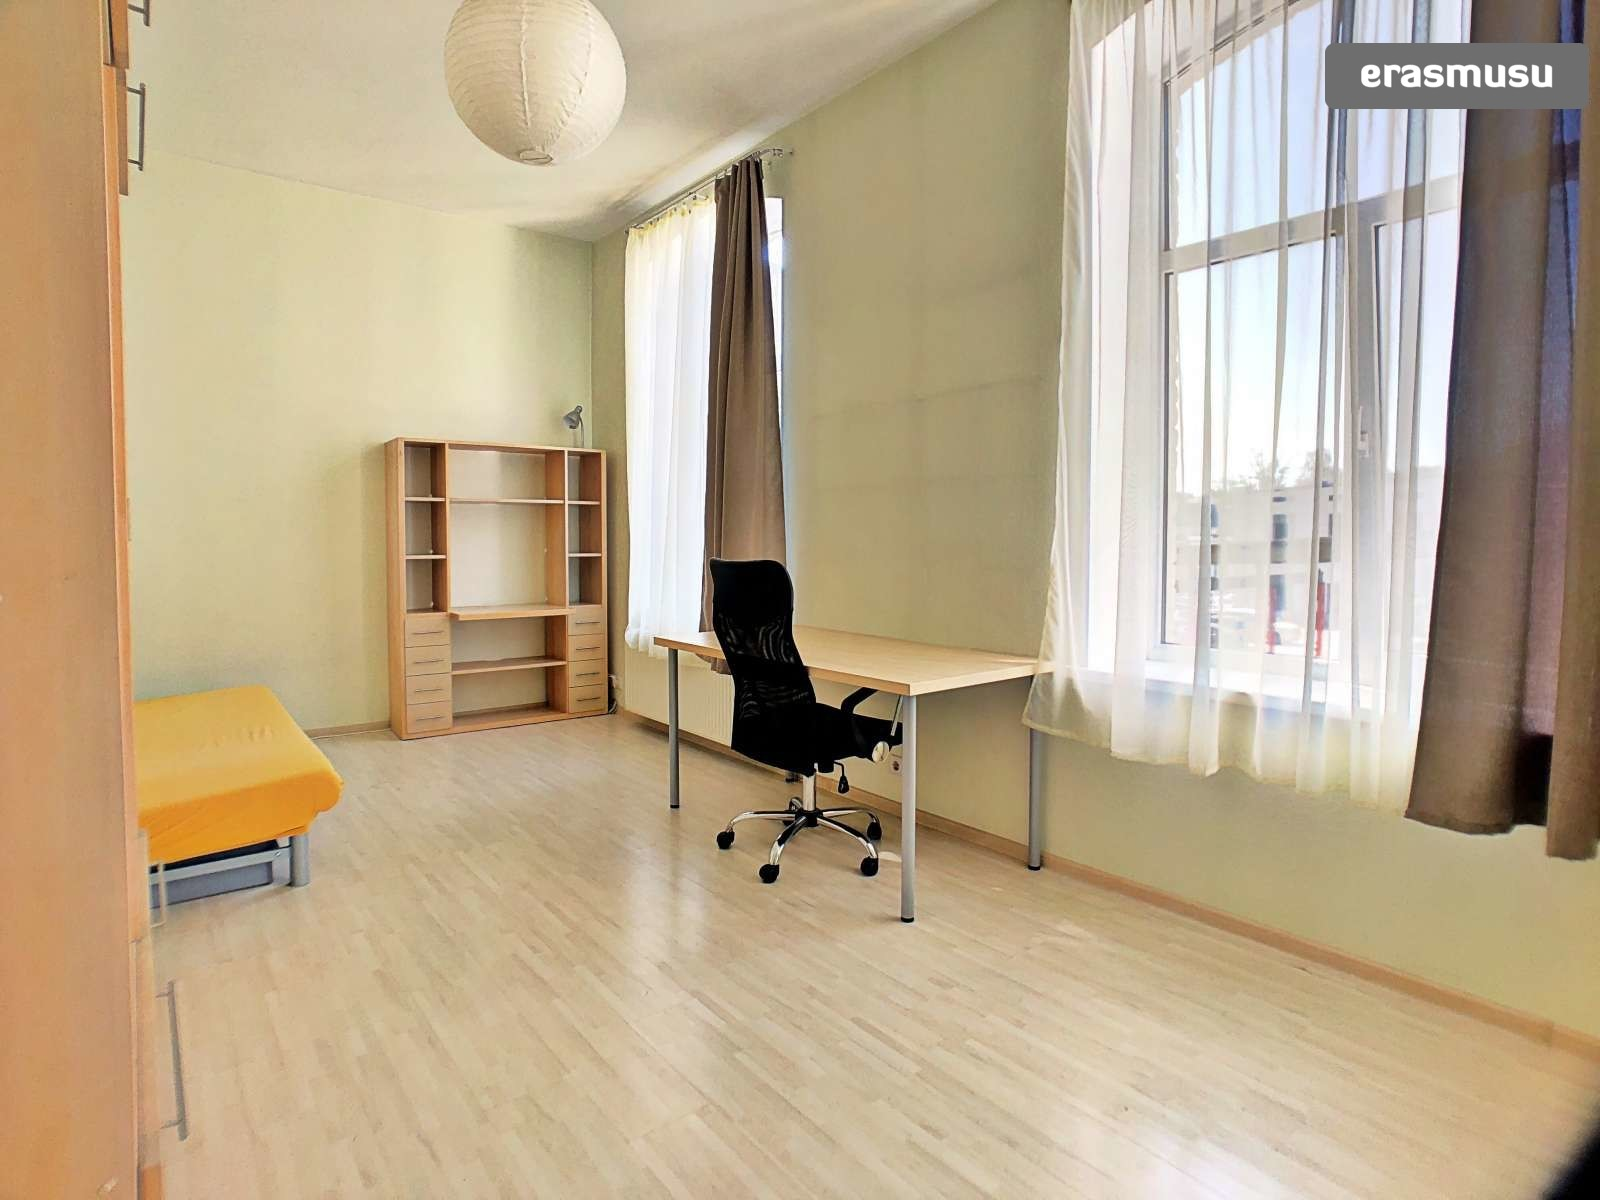 cheery-cute-studio-apartment-rent-dzirciems-3076ddee9f3229badb6e